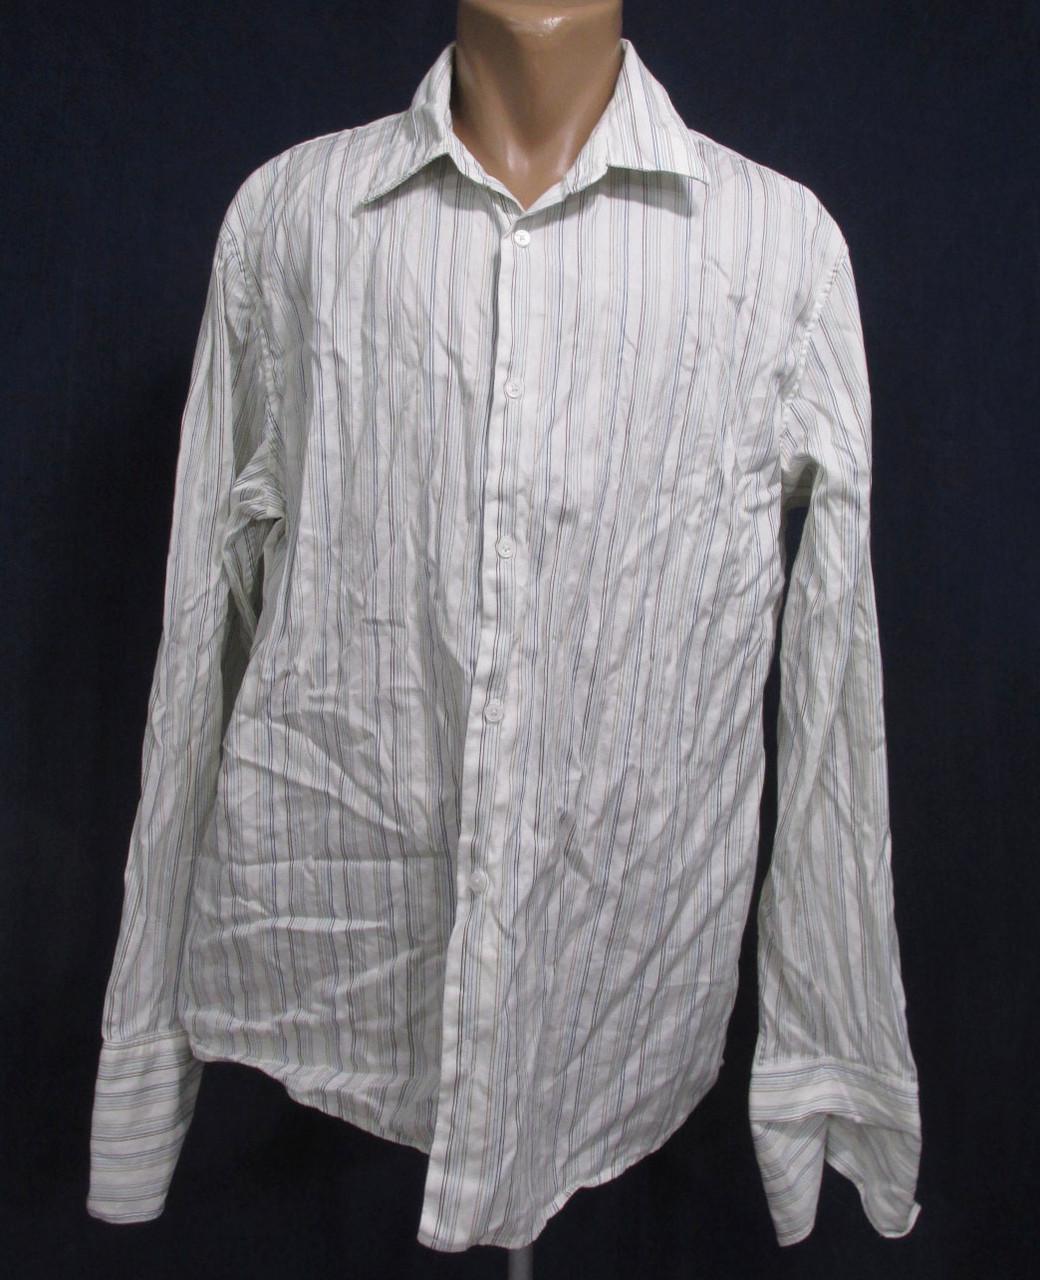 Рубашка CALVIN Klein, XL, Cotton, Отл сост!